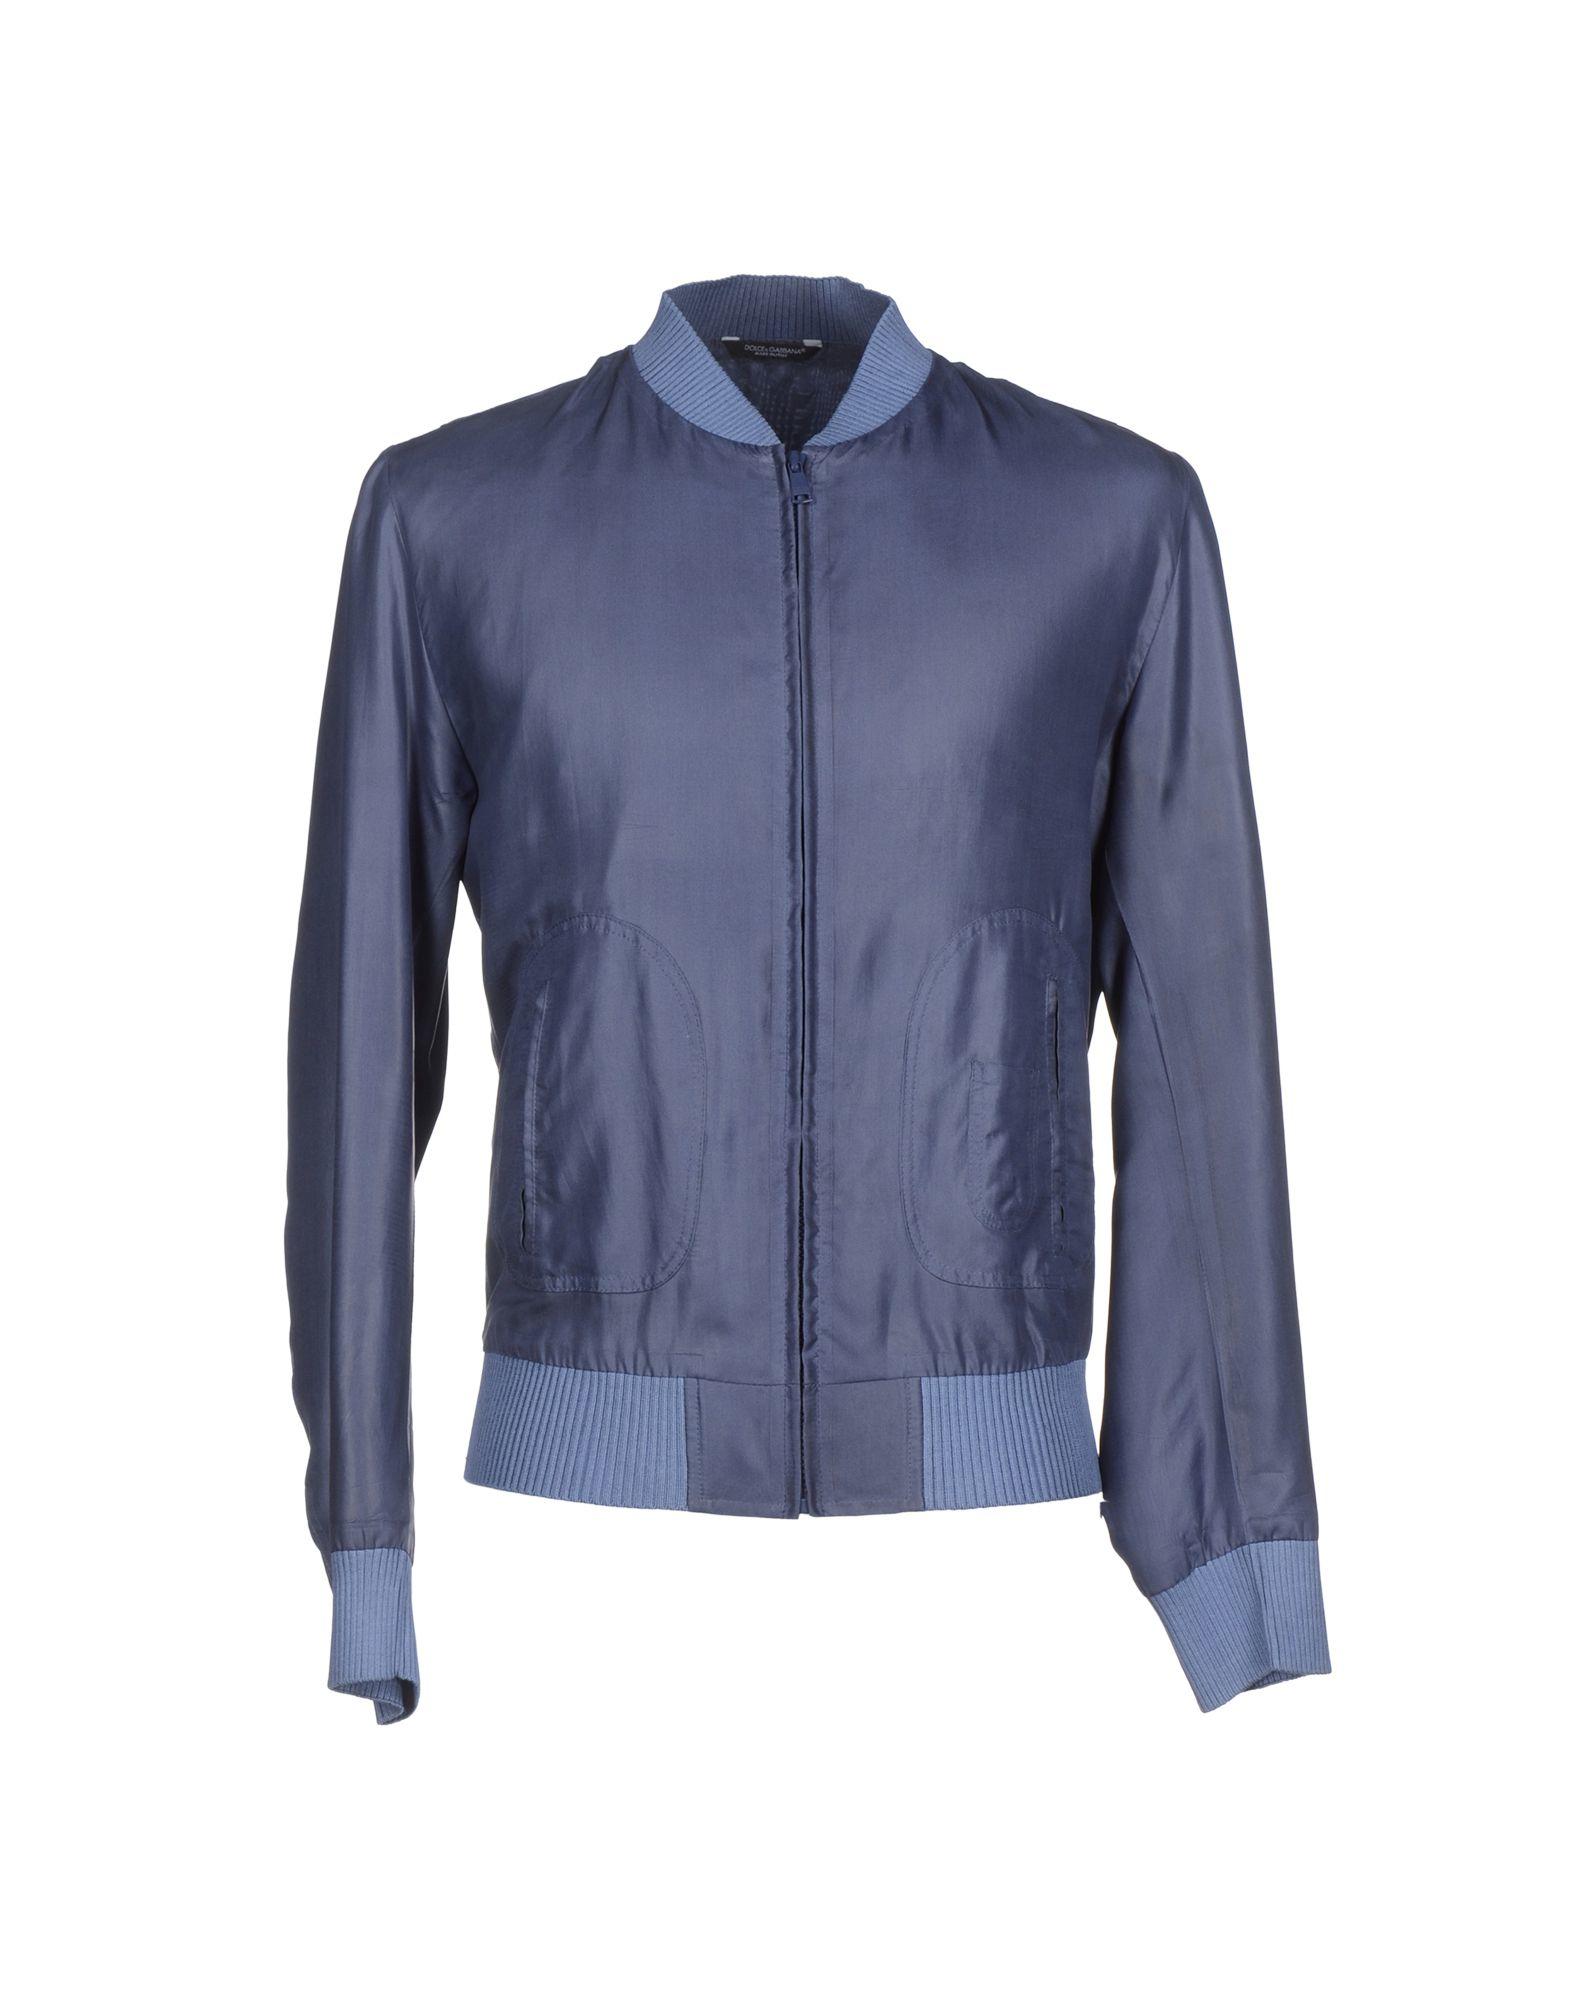 Lyst Dolce Amp Gabbana Jacket In Gray For Men